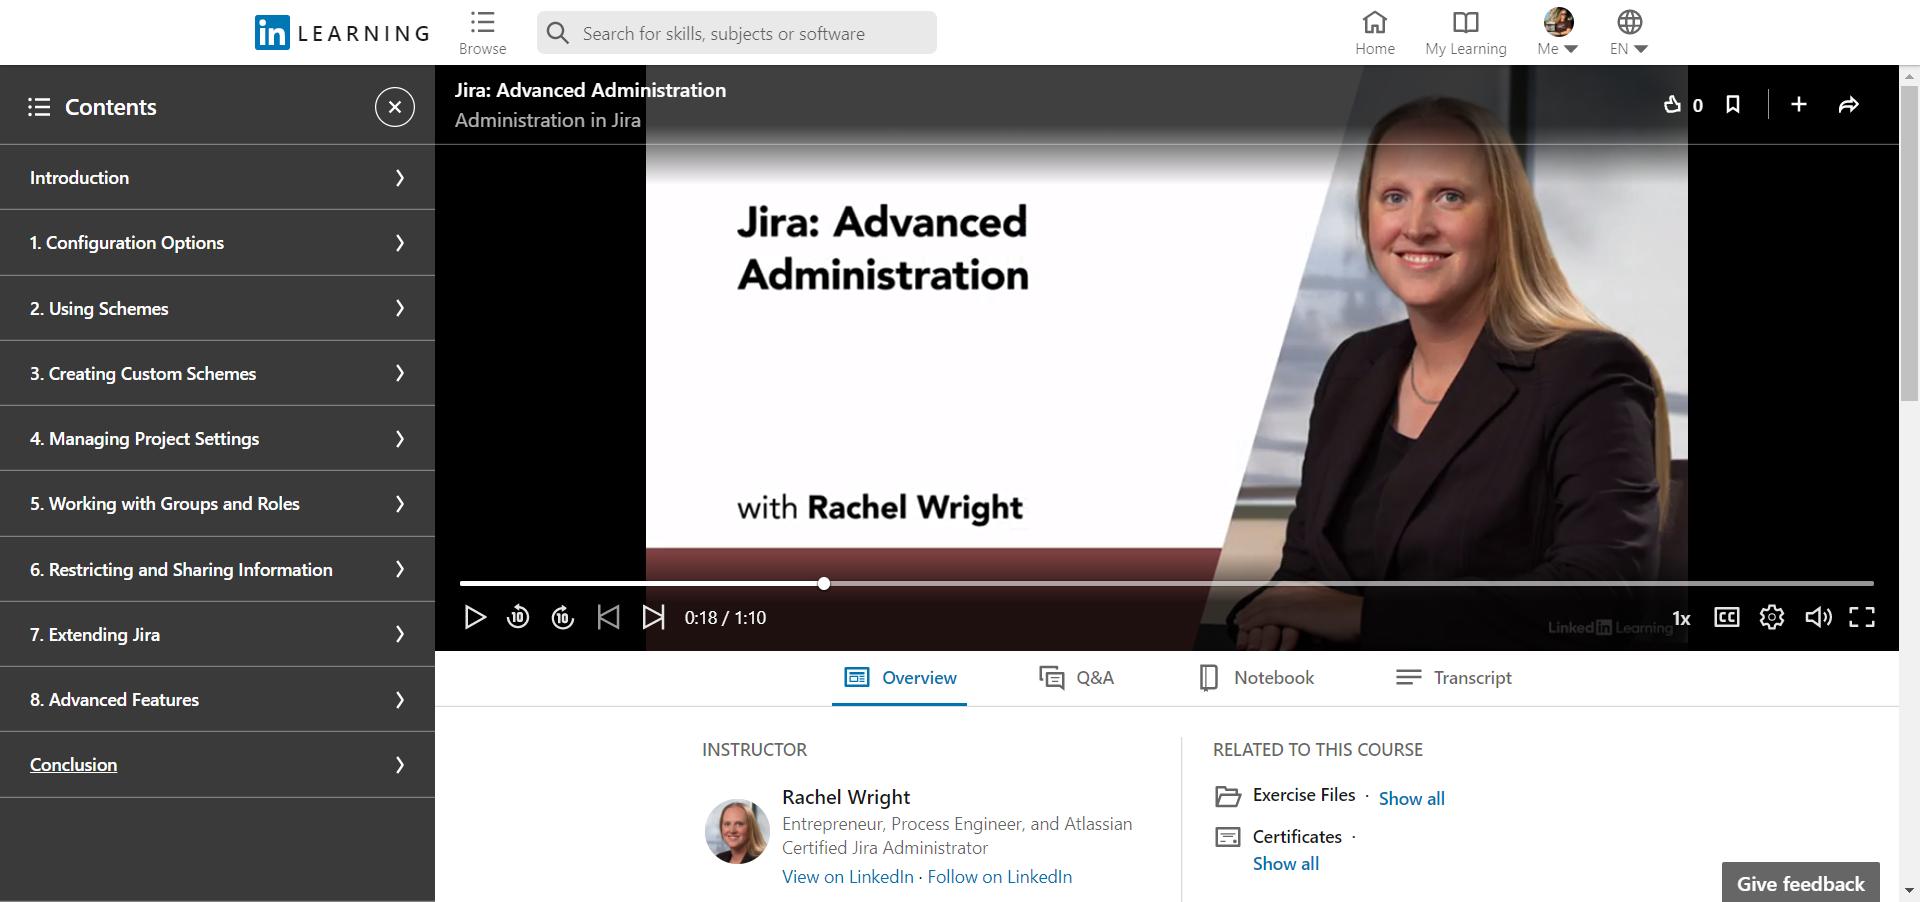 Jira: Advanced Administration